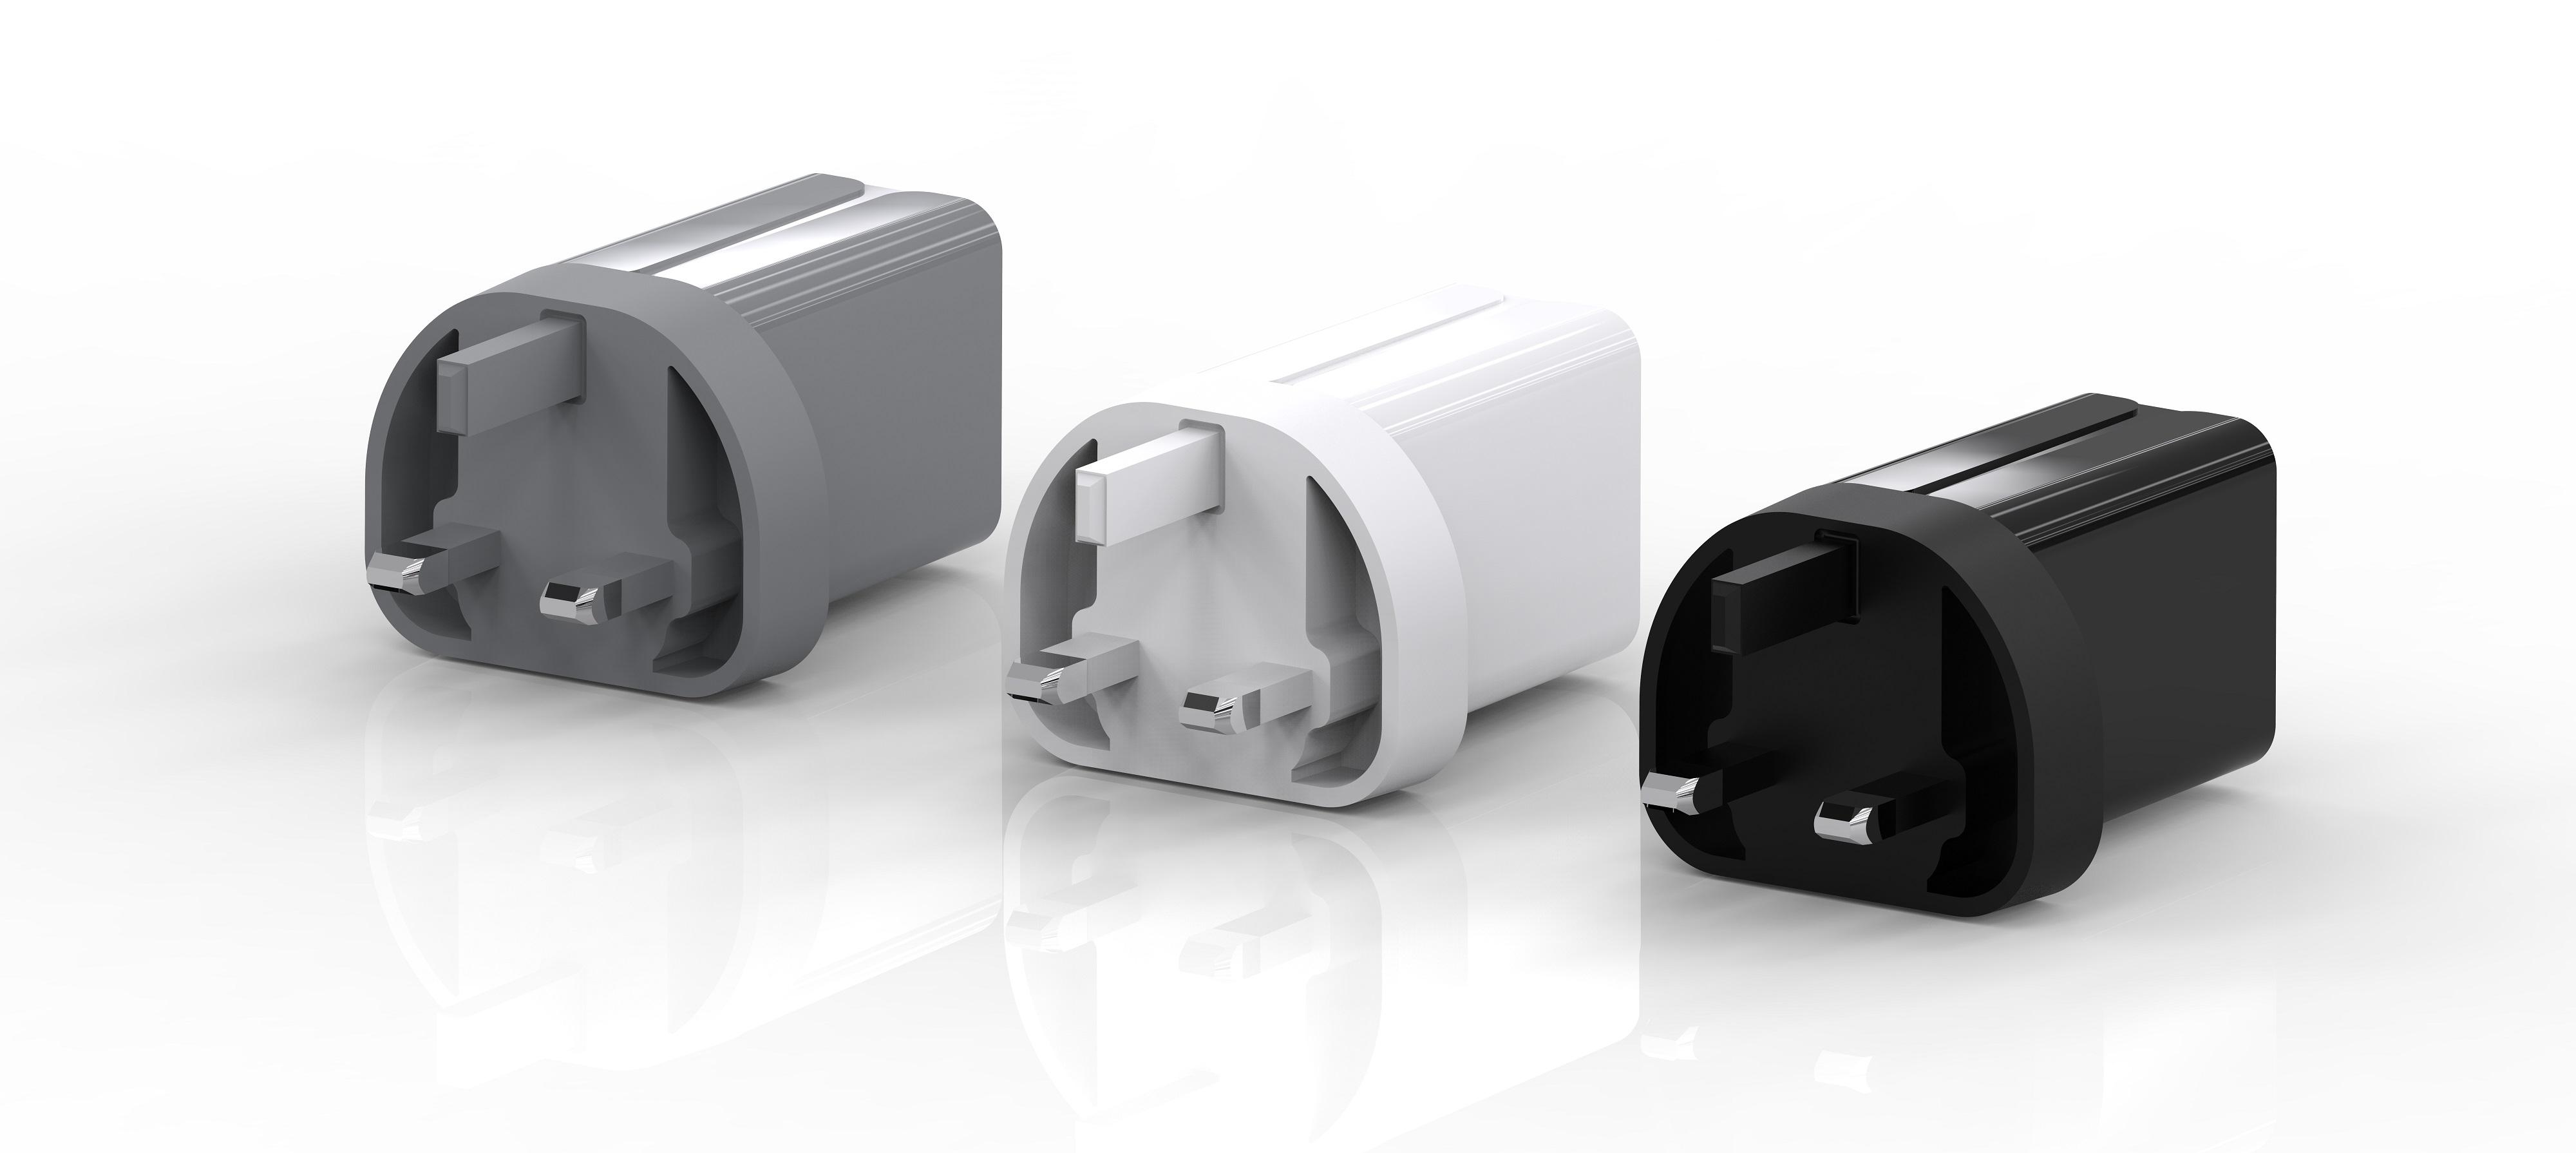 TS15A 5V/3.4A Dual USB Ports Car Charger